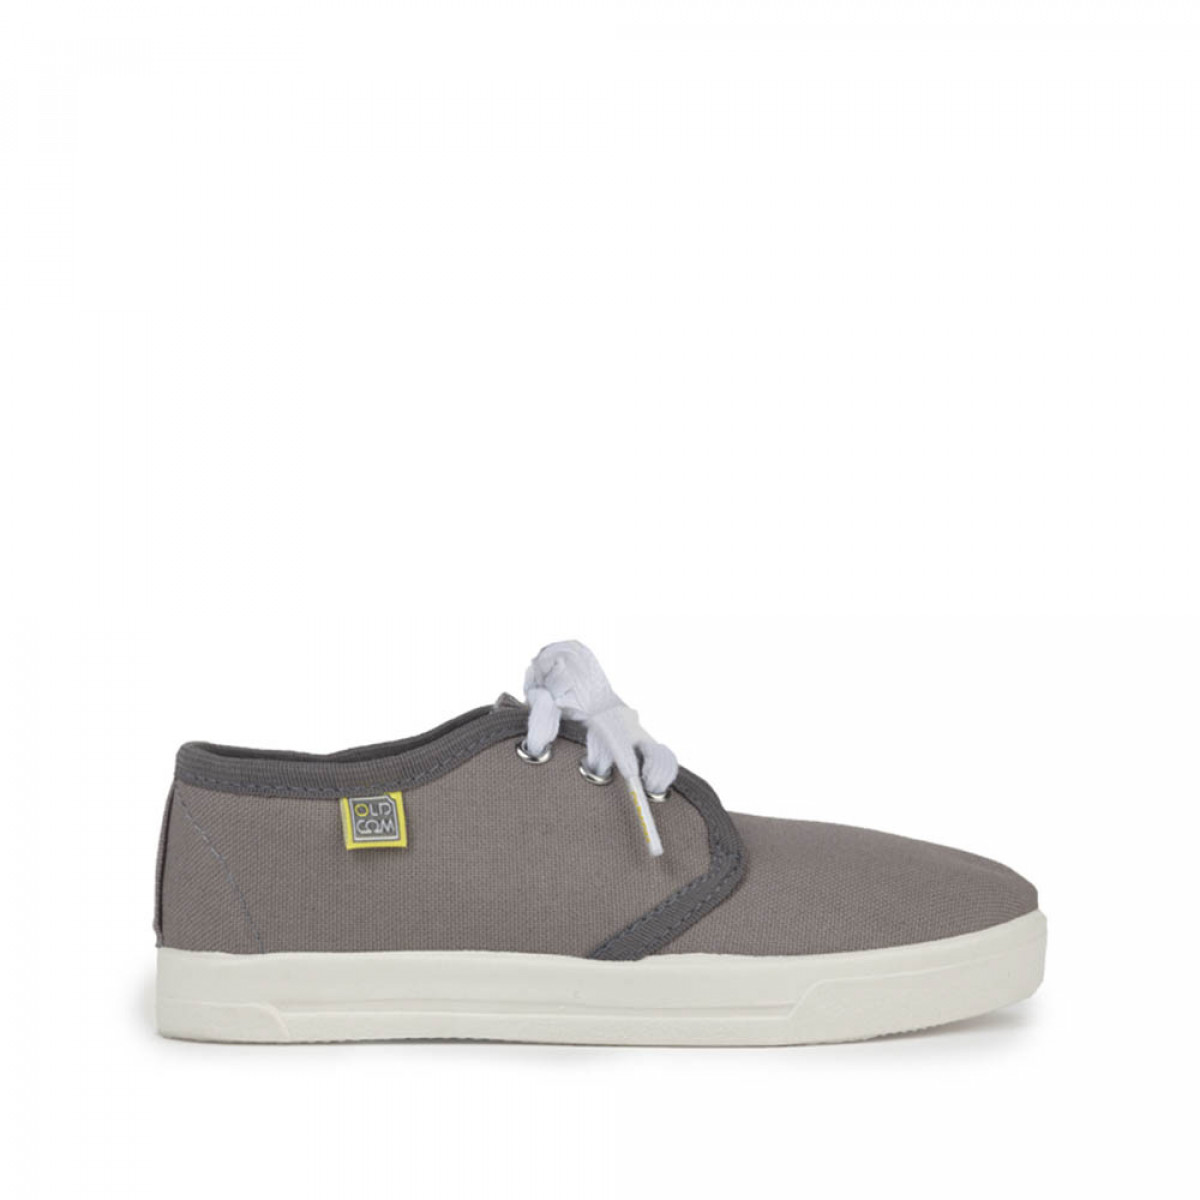 Kid's Sneakers DERBY, Titanium